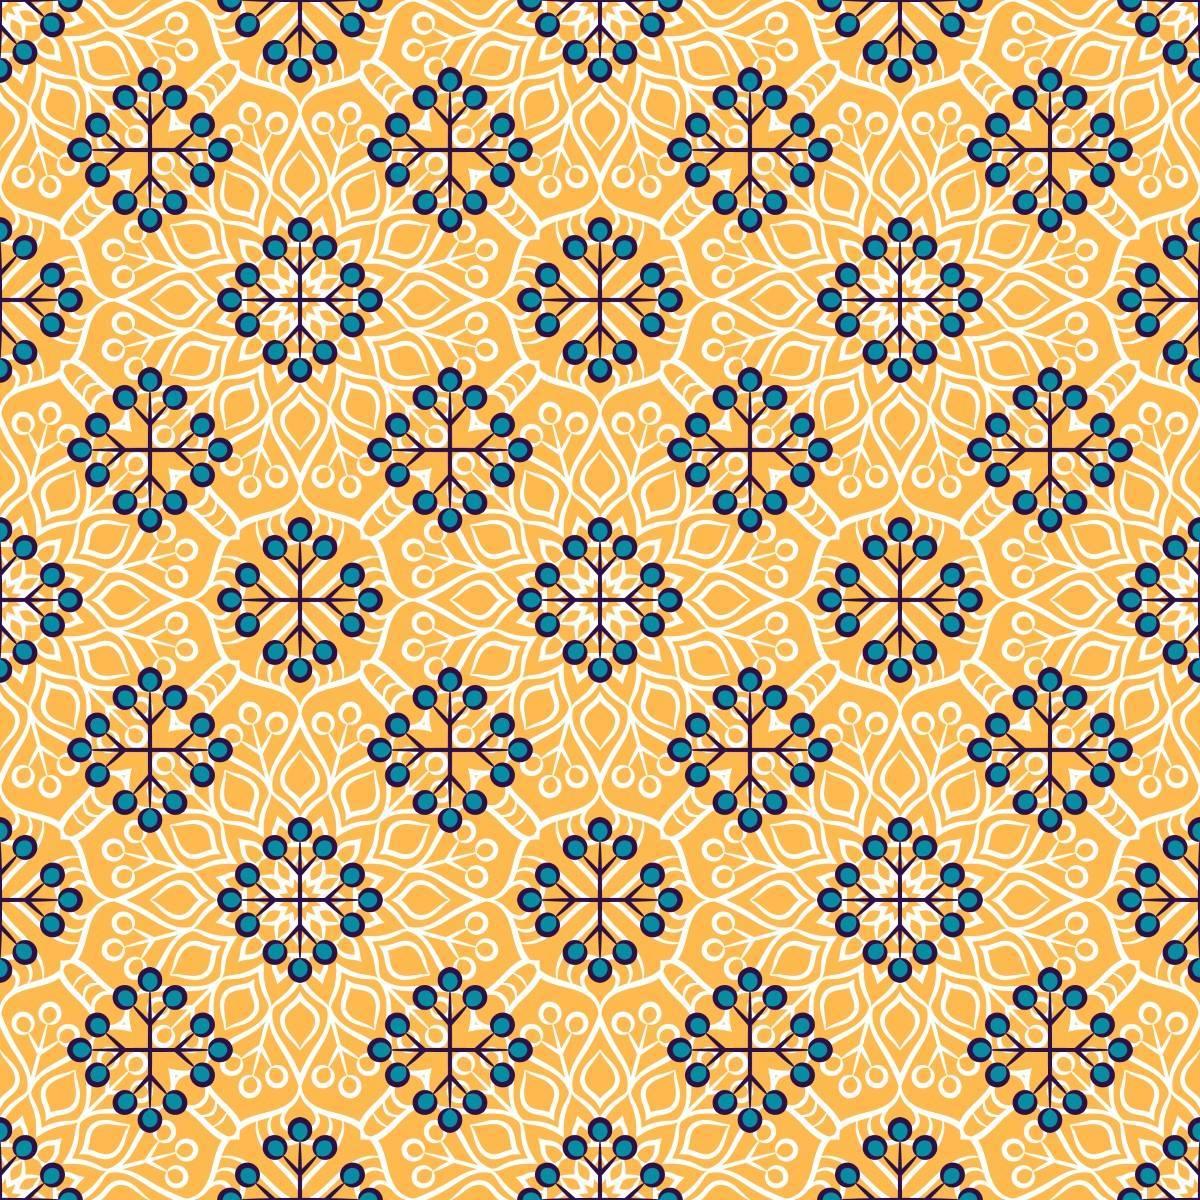 Papel de Parede Amarelo | Adesivo Vinilico imagem 2